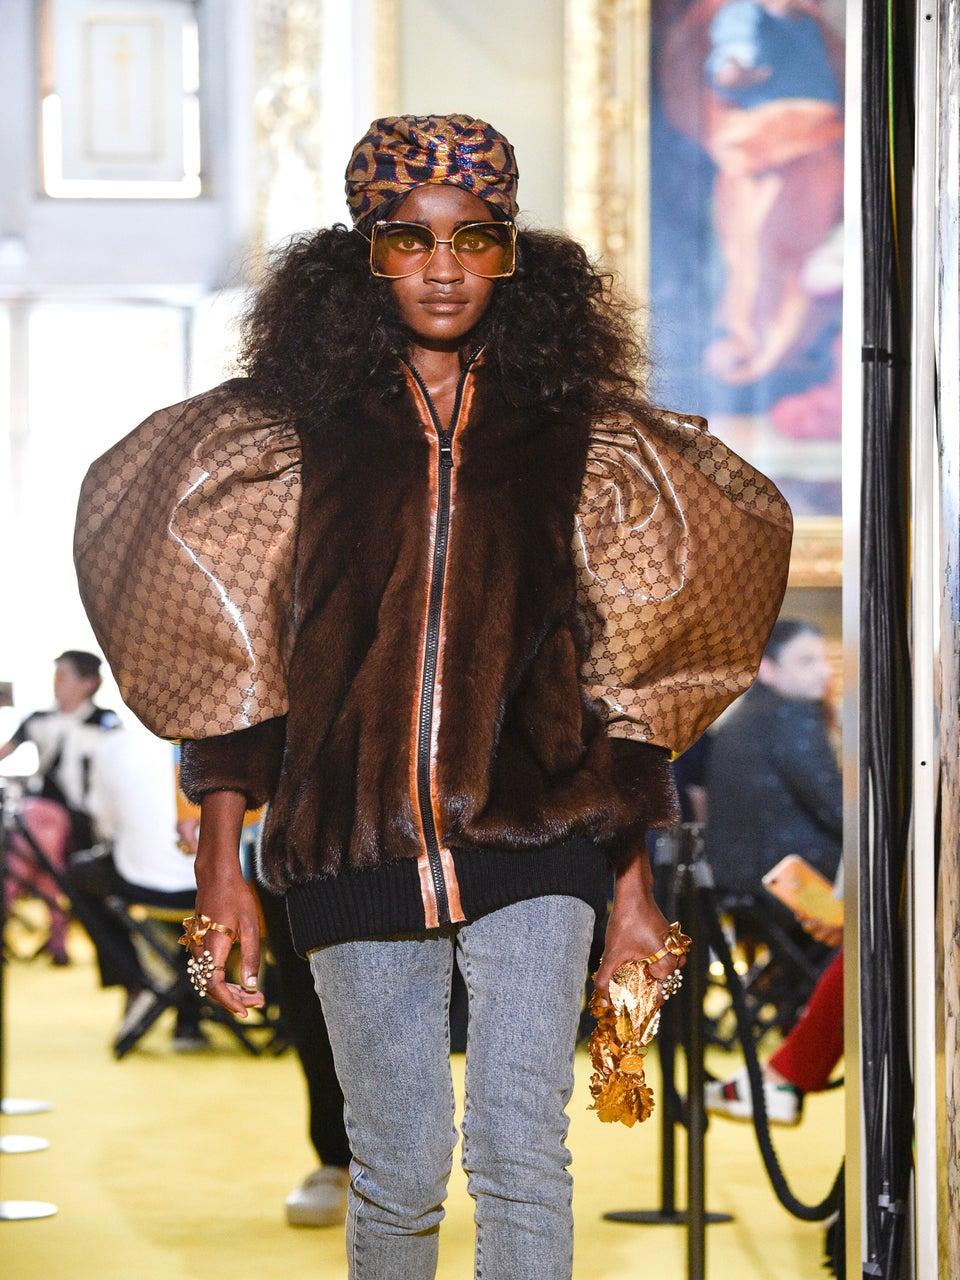 Gucci Cruise Jacket Looks Like Blatant Copy Of Iconic Dapper Dan Design